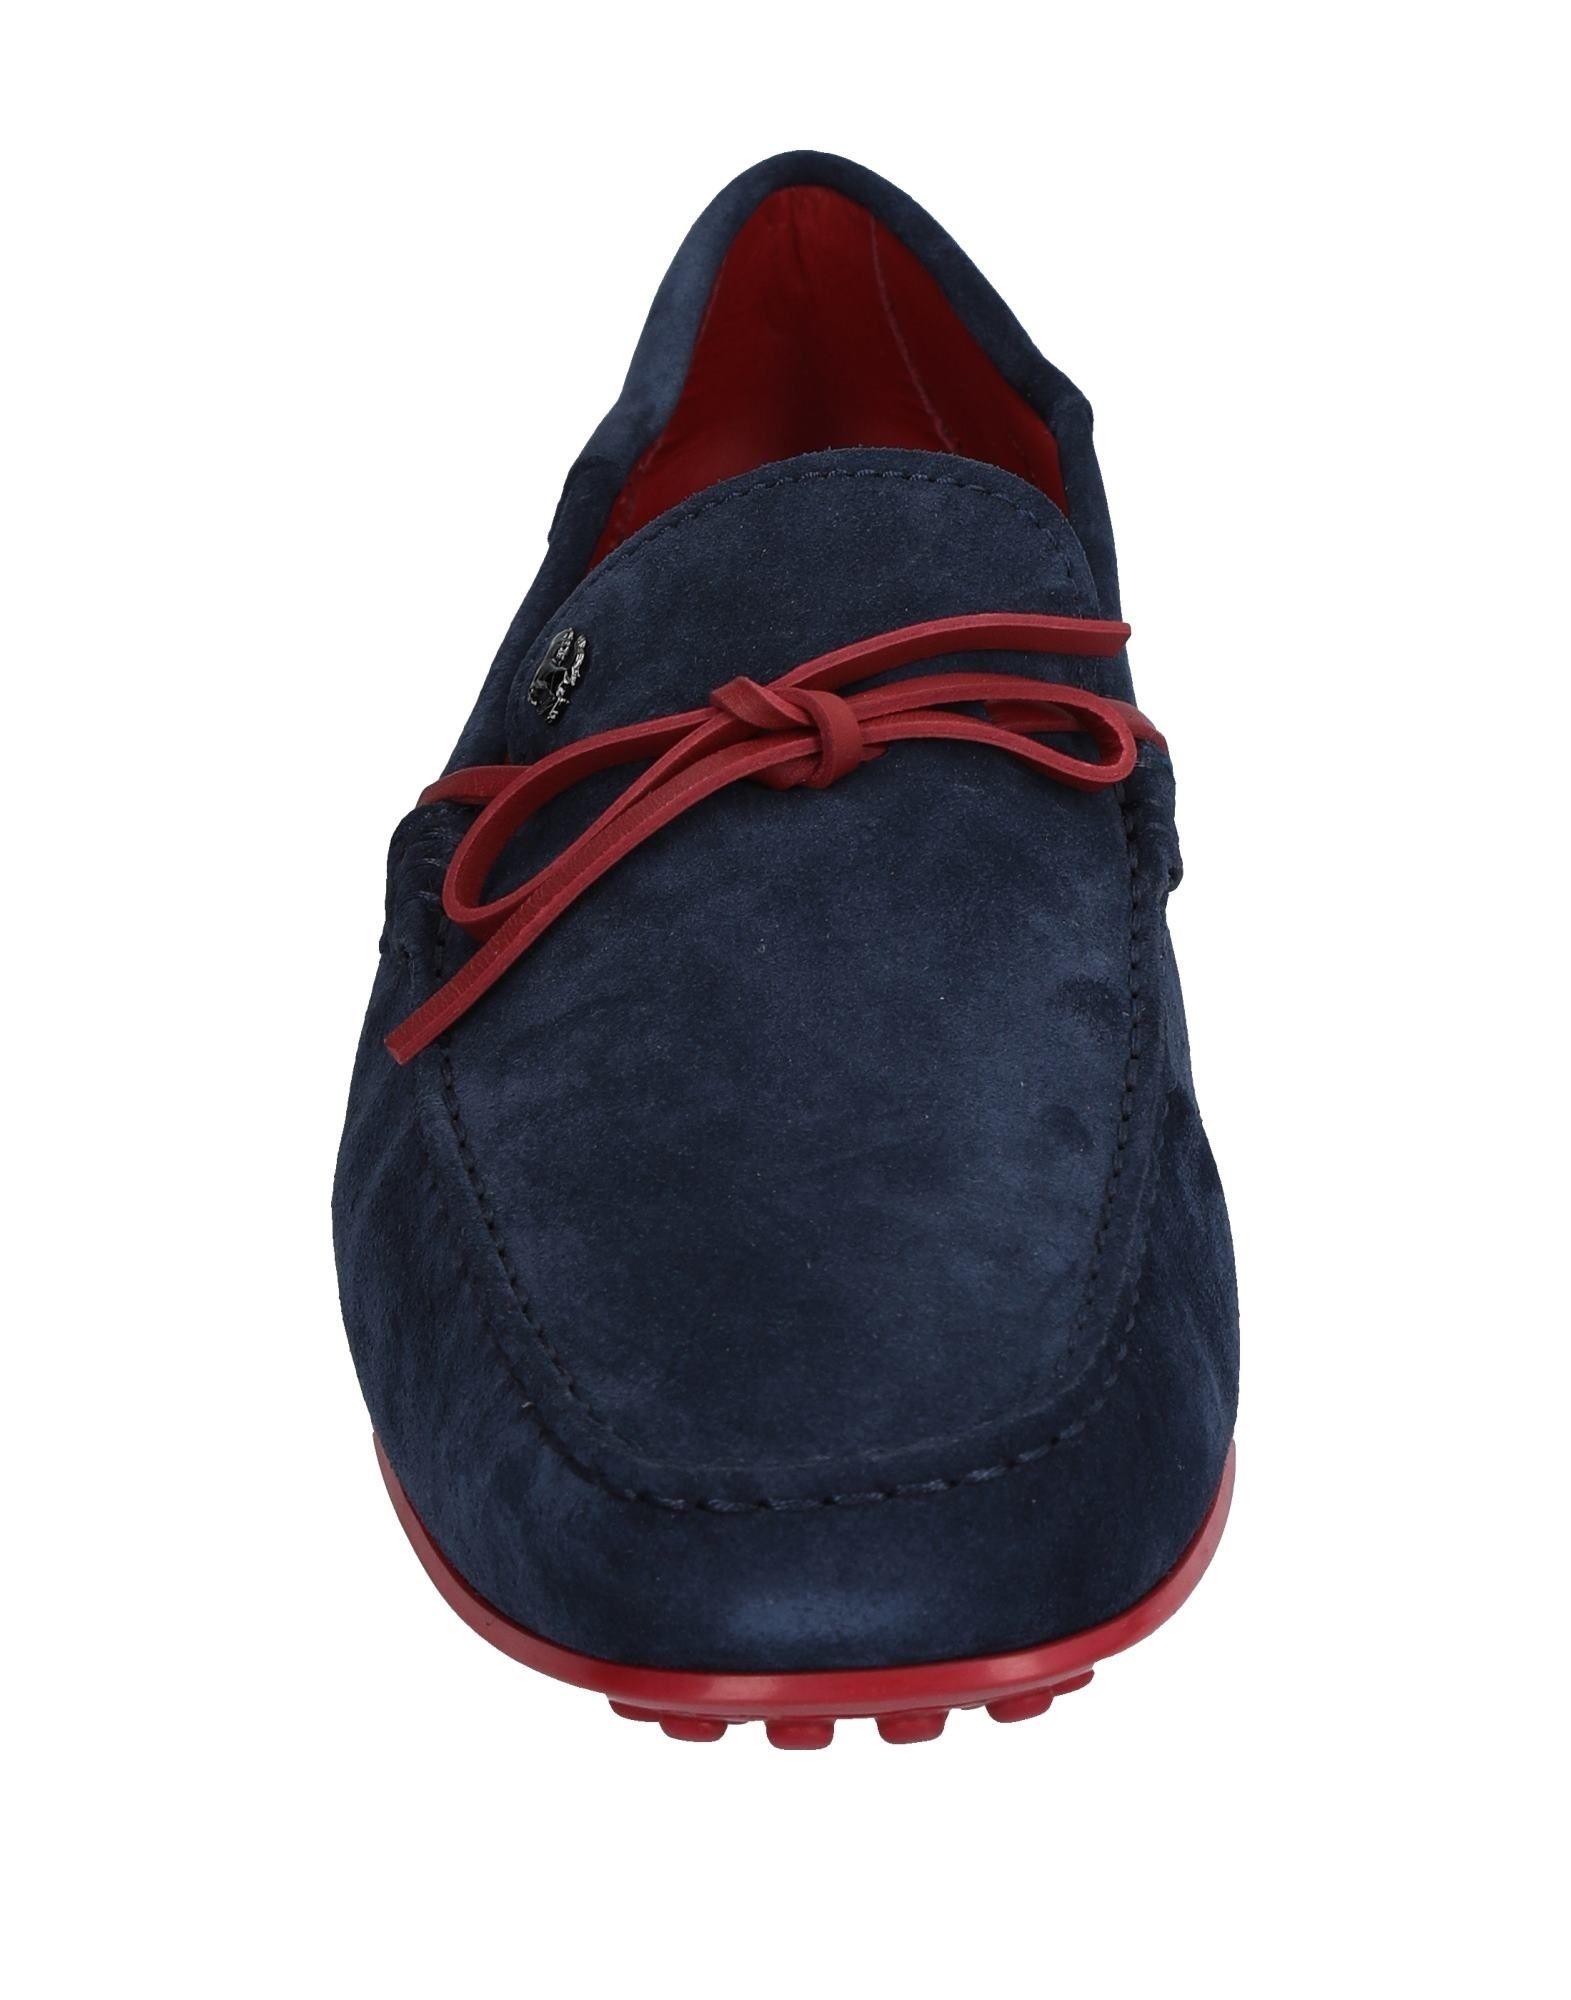 Tod's Mokassins Herren  11541851PH Gute Qualität beliebte Schuhe